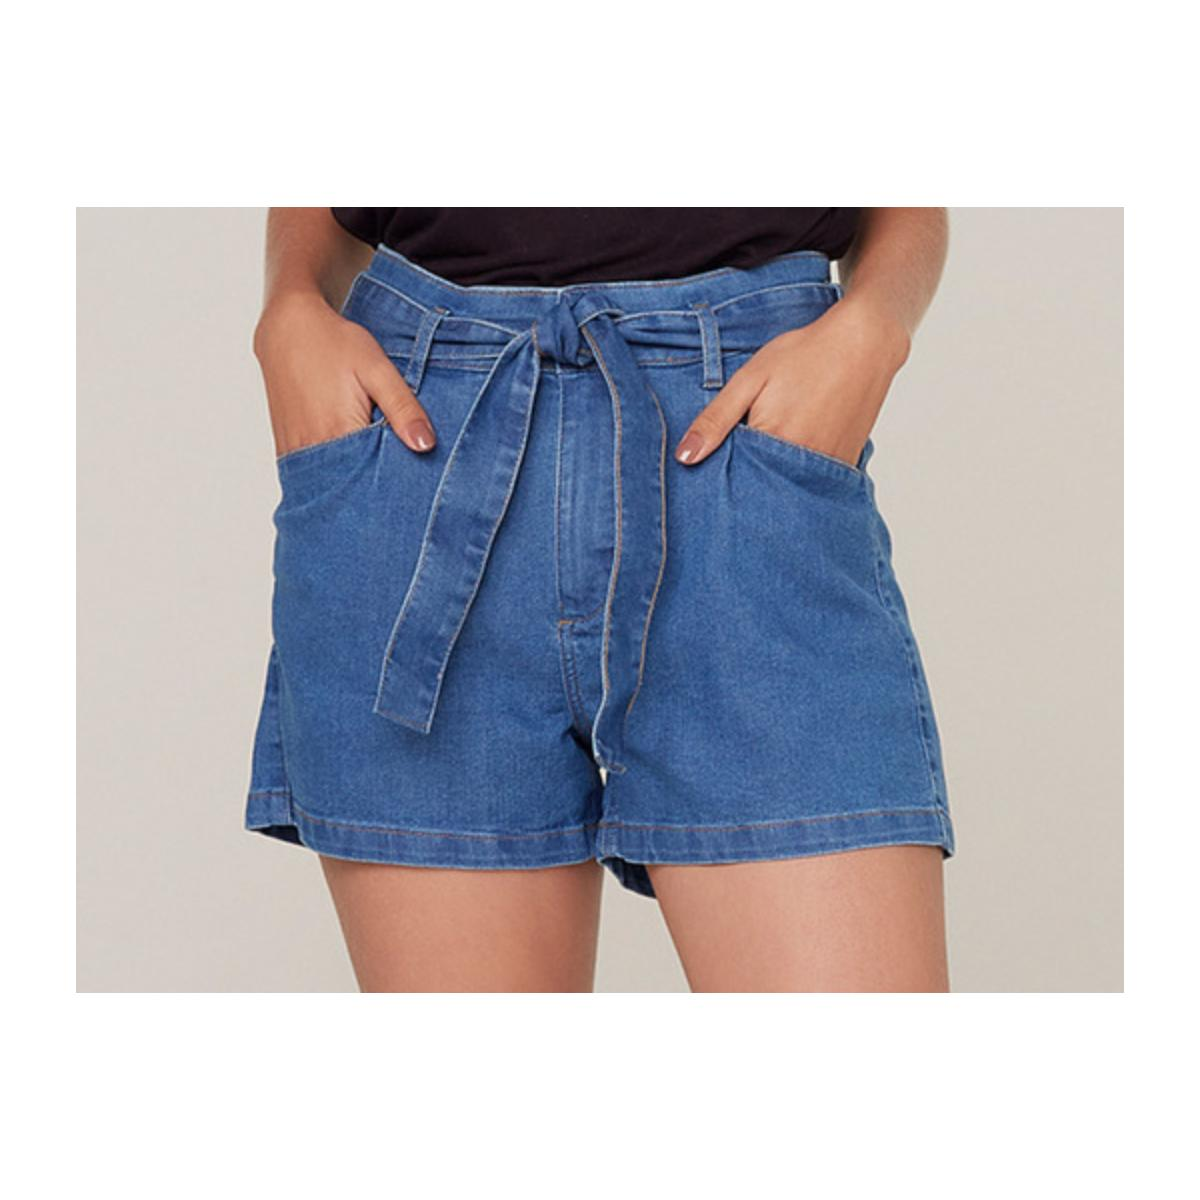 Short Feminino Dzarm Zc4m 1asn Jeans Escuro